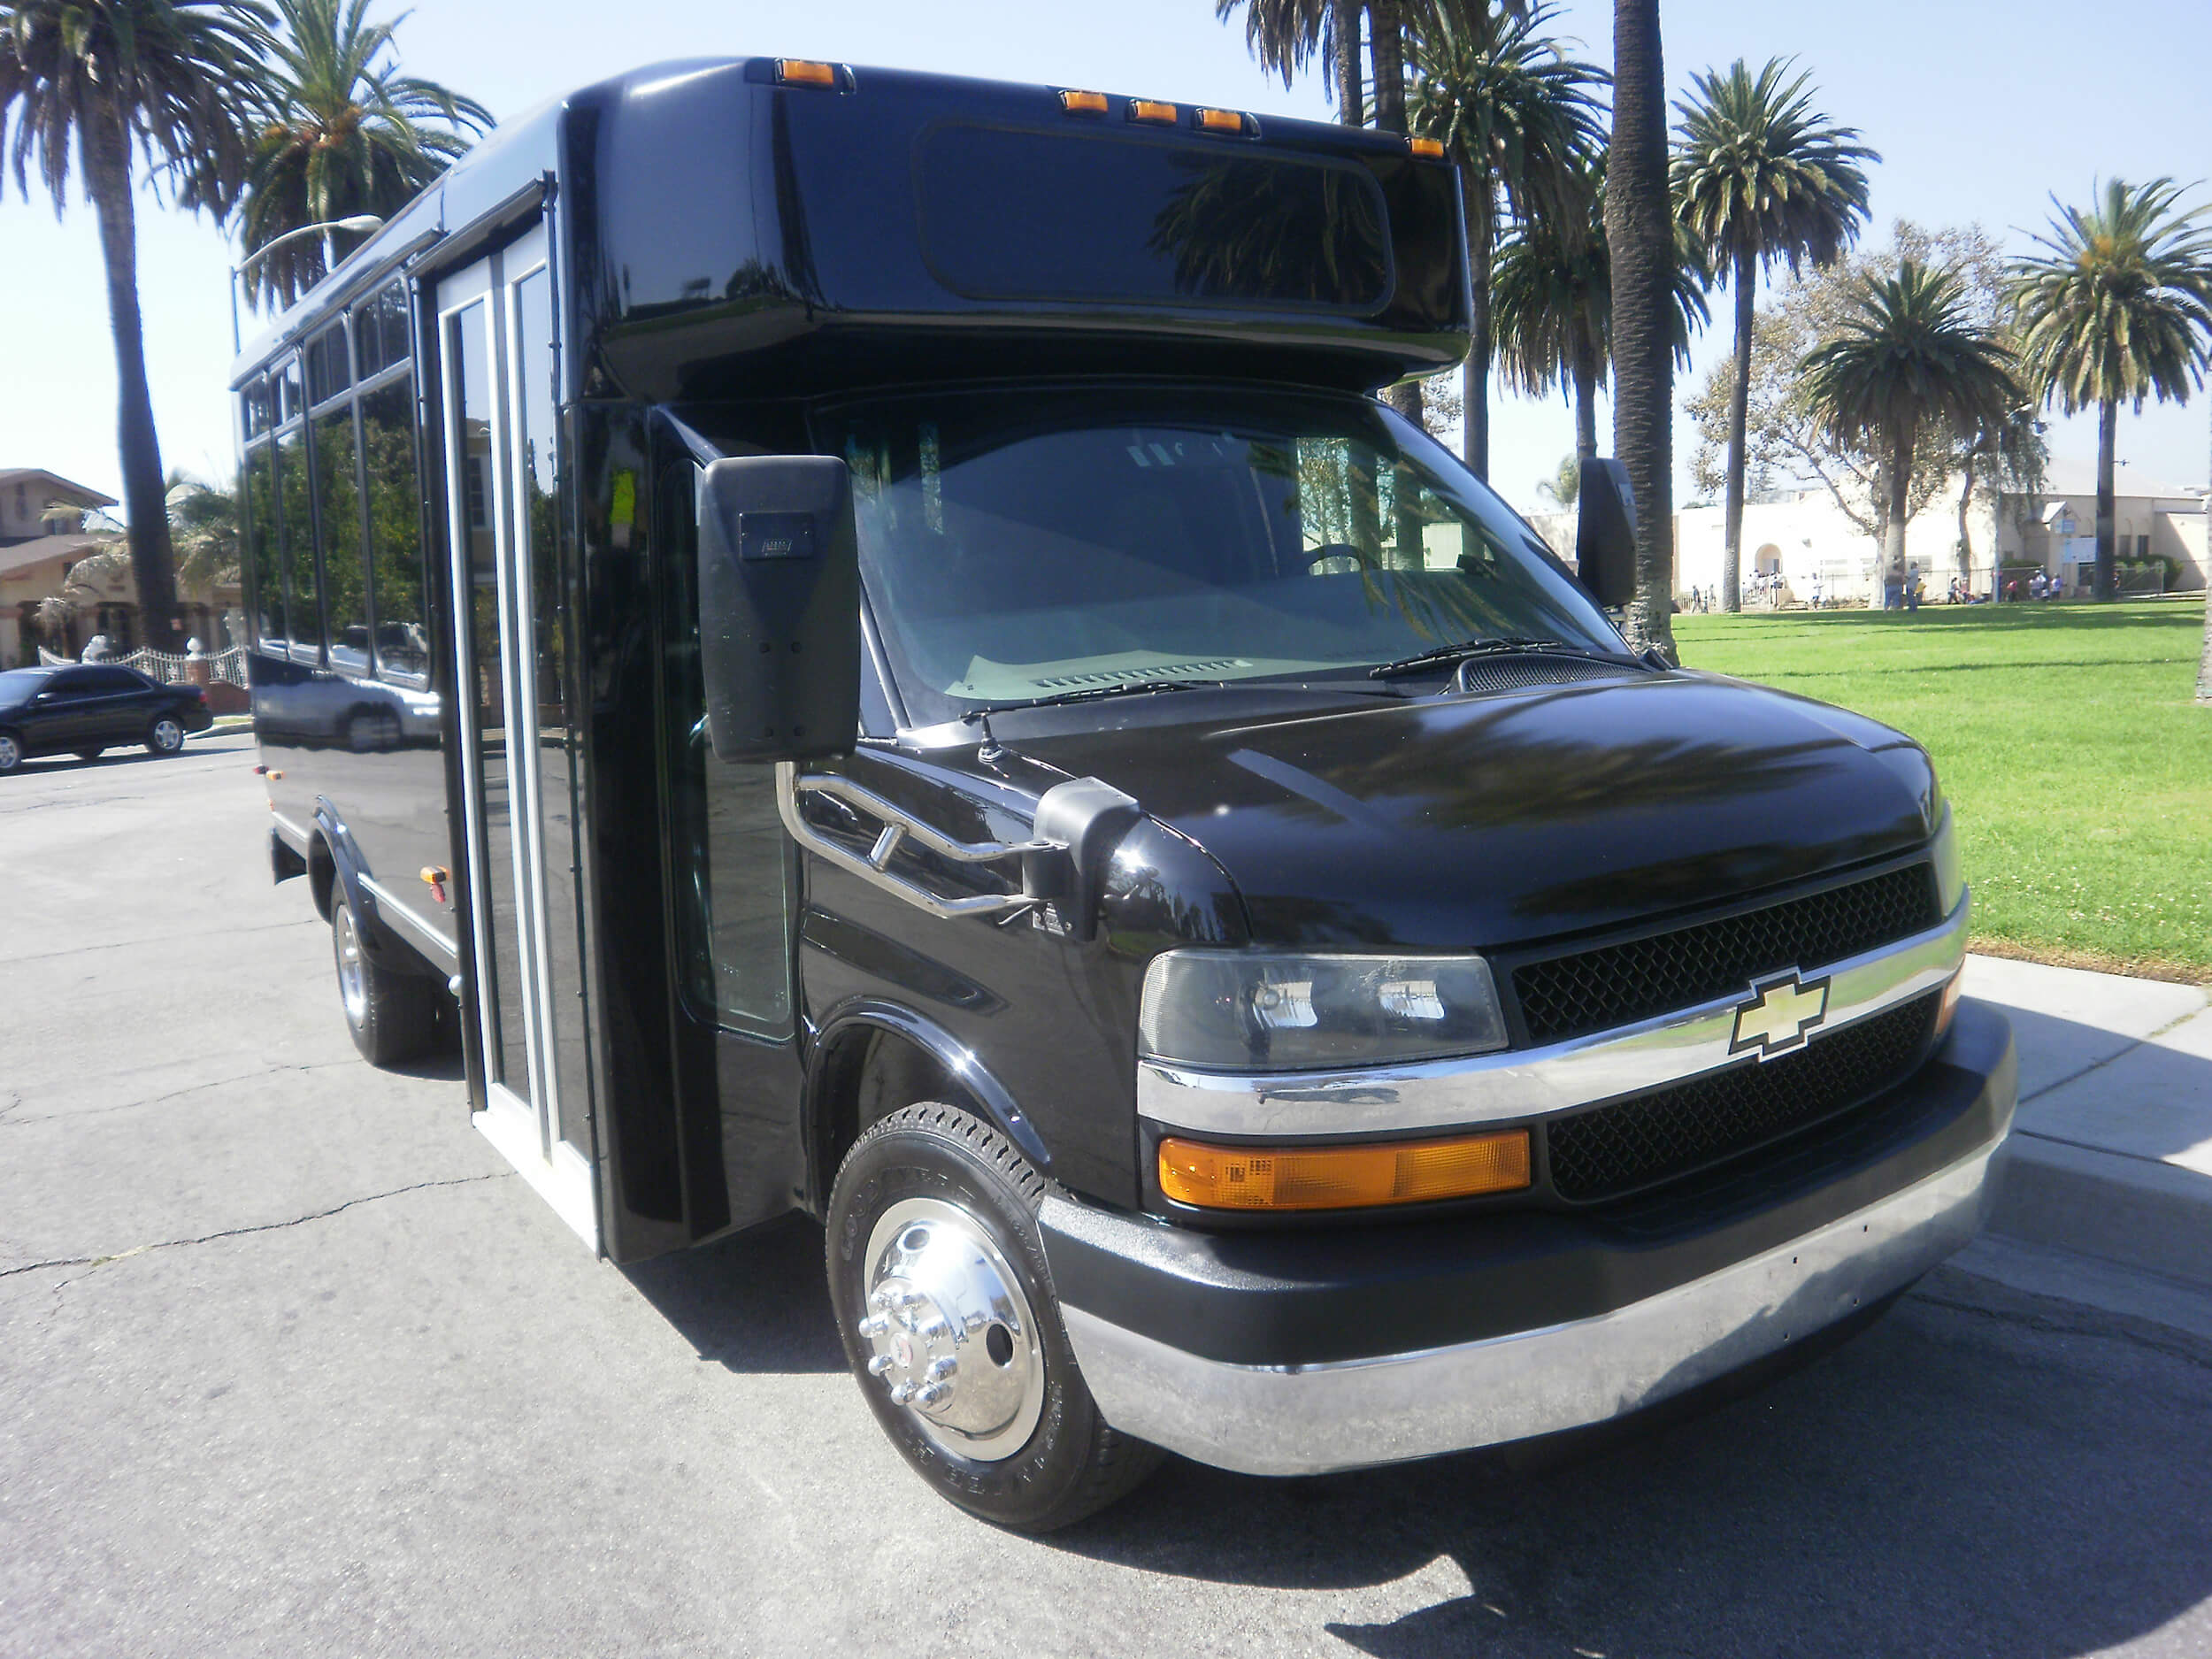 Chevy Dealership Las Vegas Nv >> Inventory American Limousine Sales | Autos Post